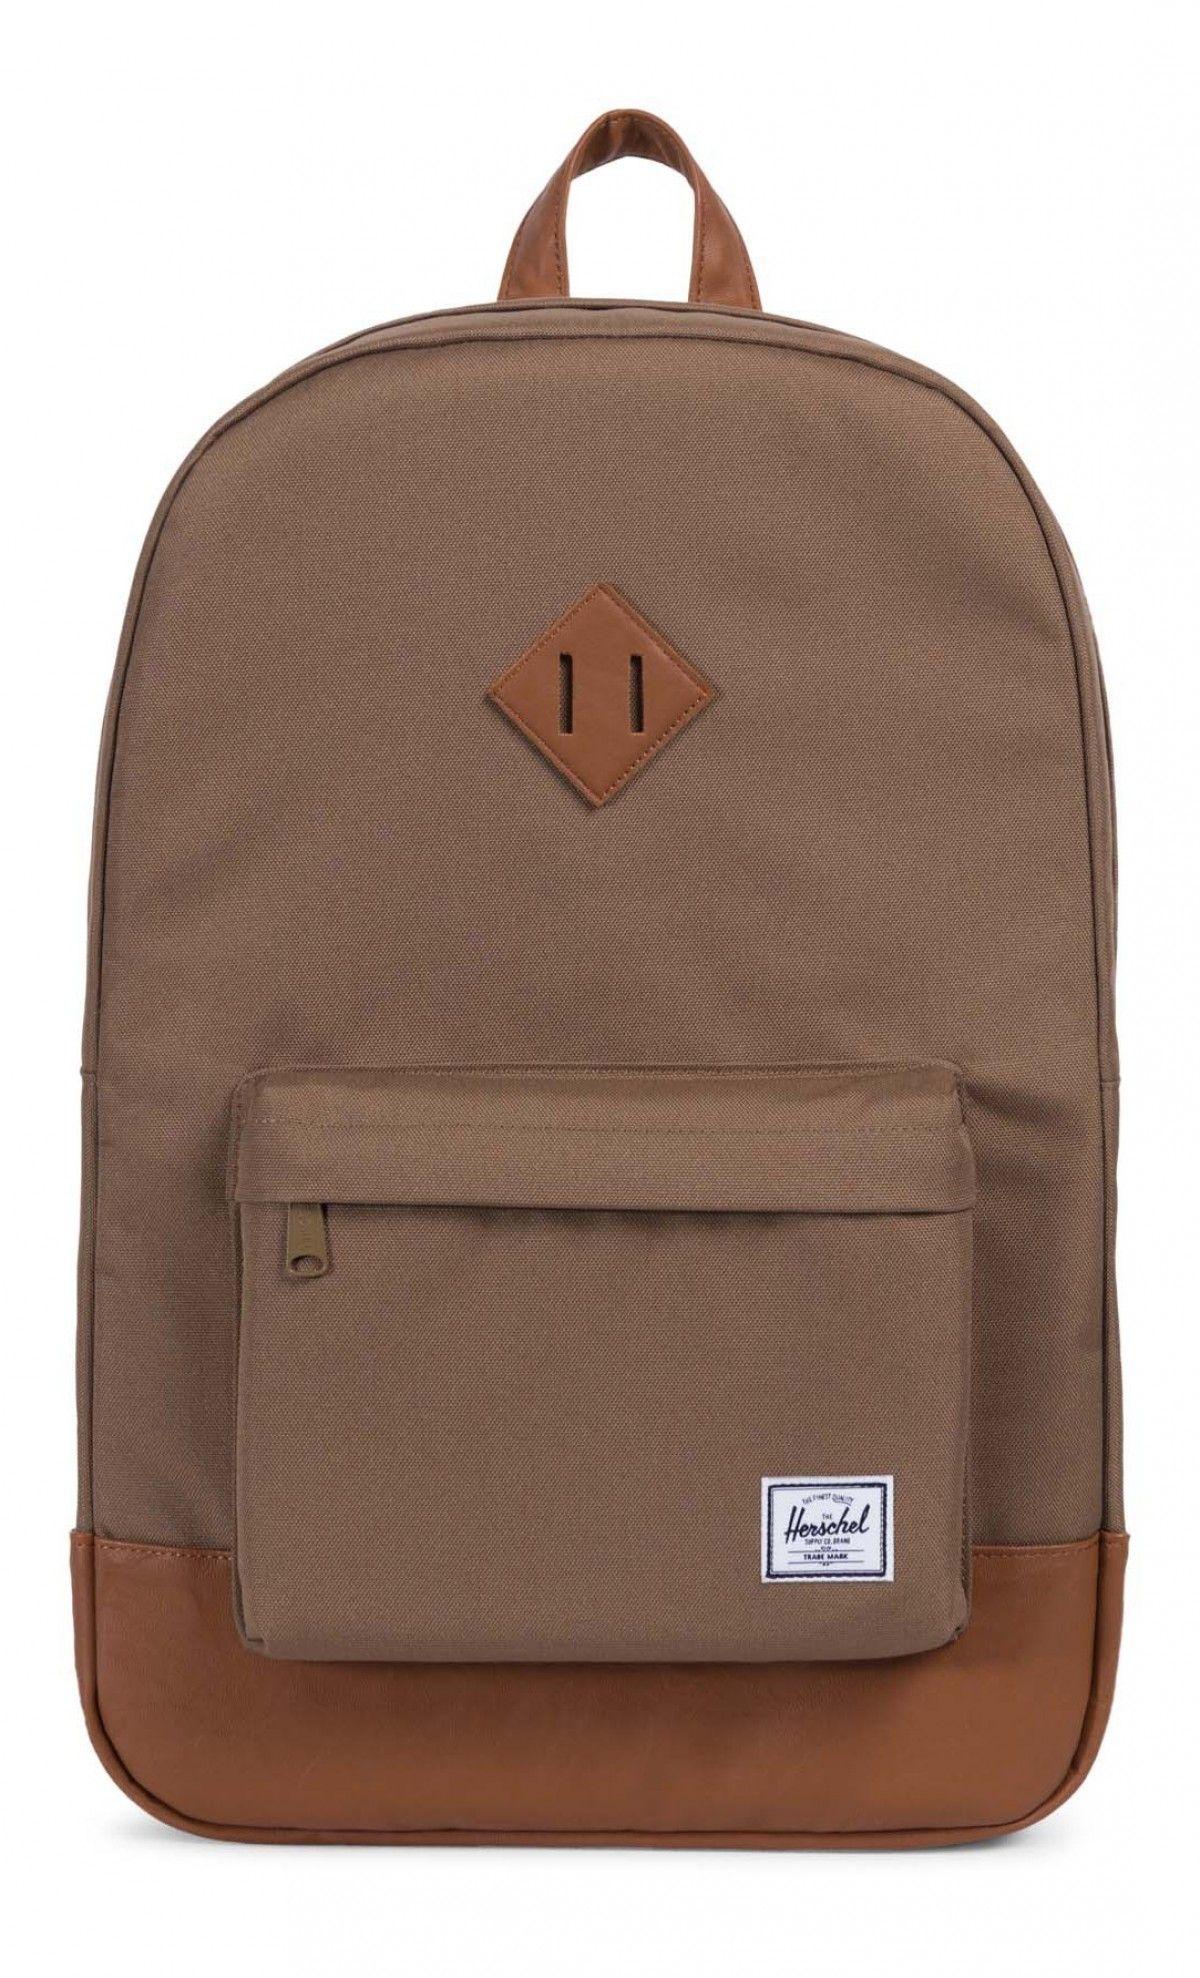 941f08283cb5 Herschel Heritage Backpack 600D Poly Cub Tan